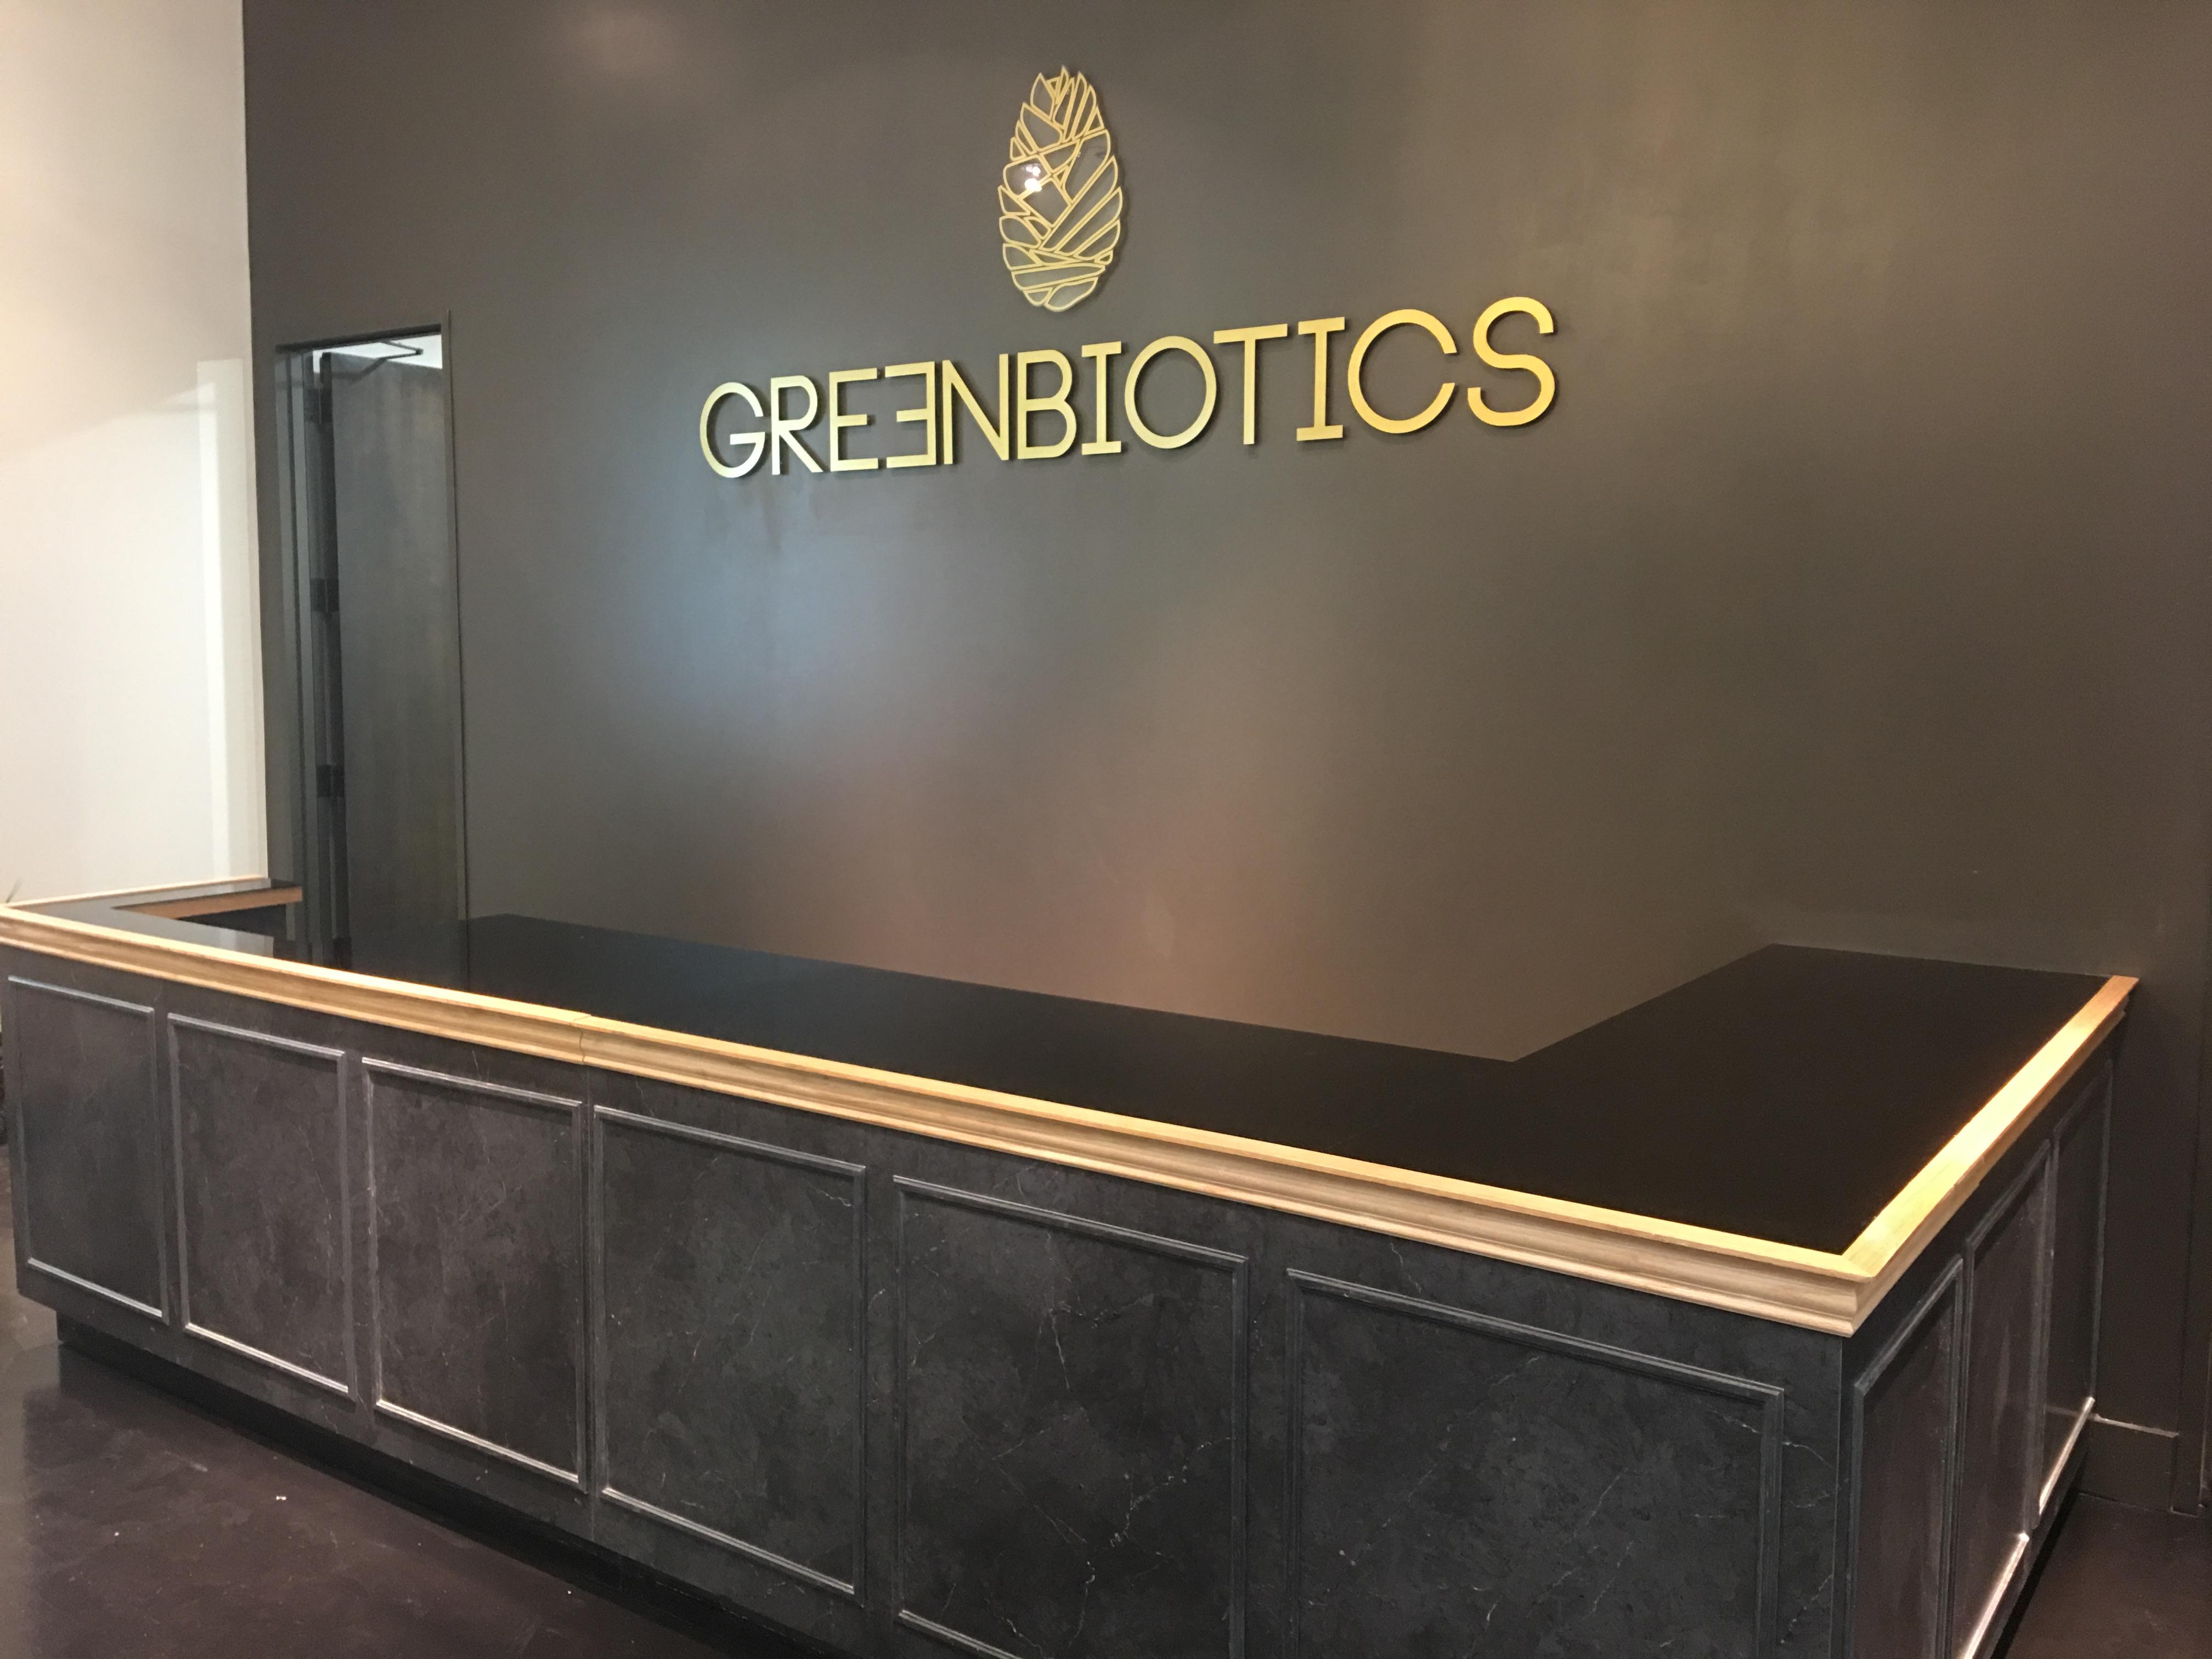 Greenbiotics acrylic logo sign